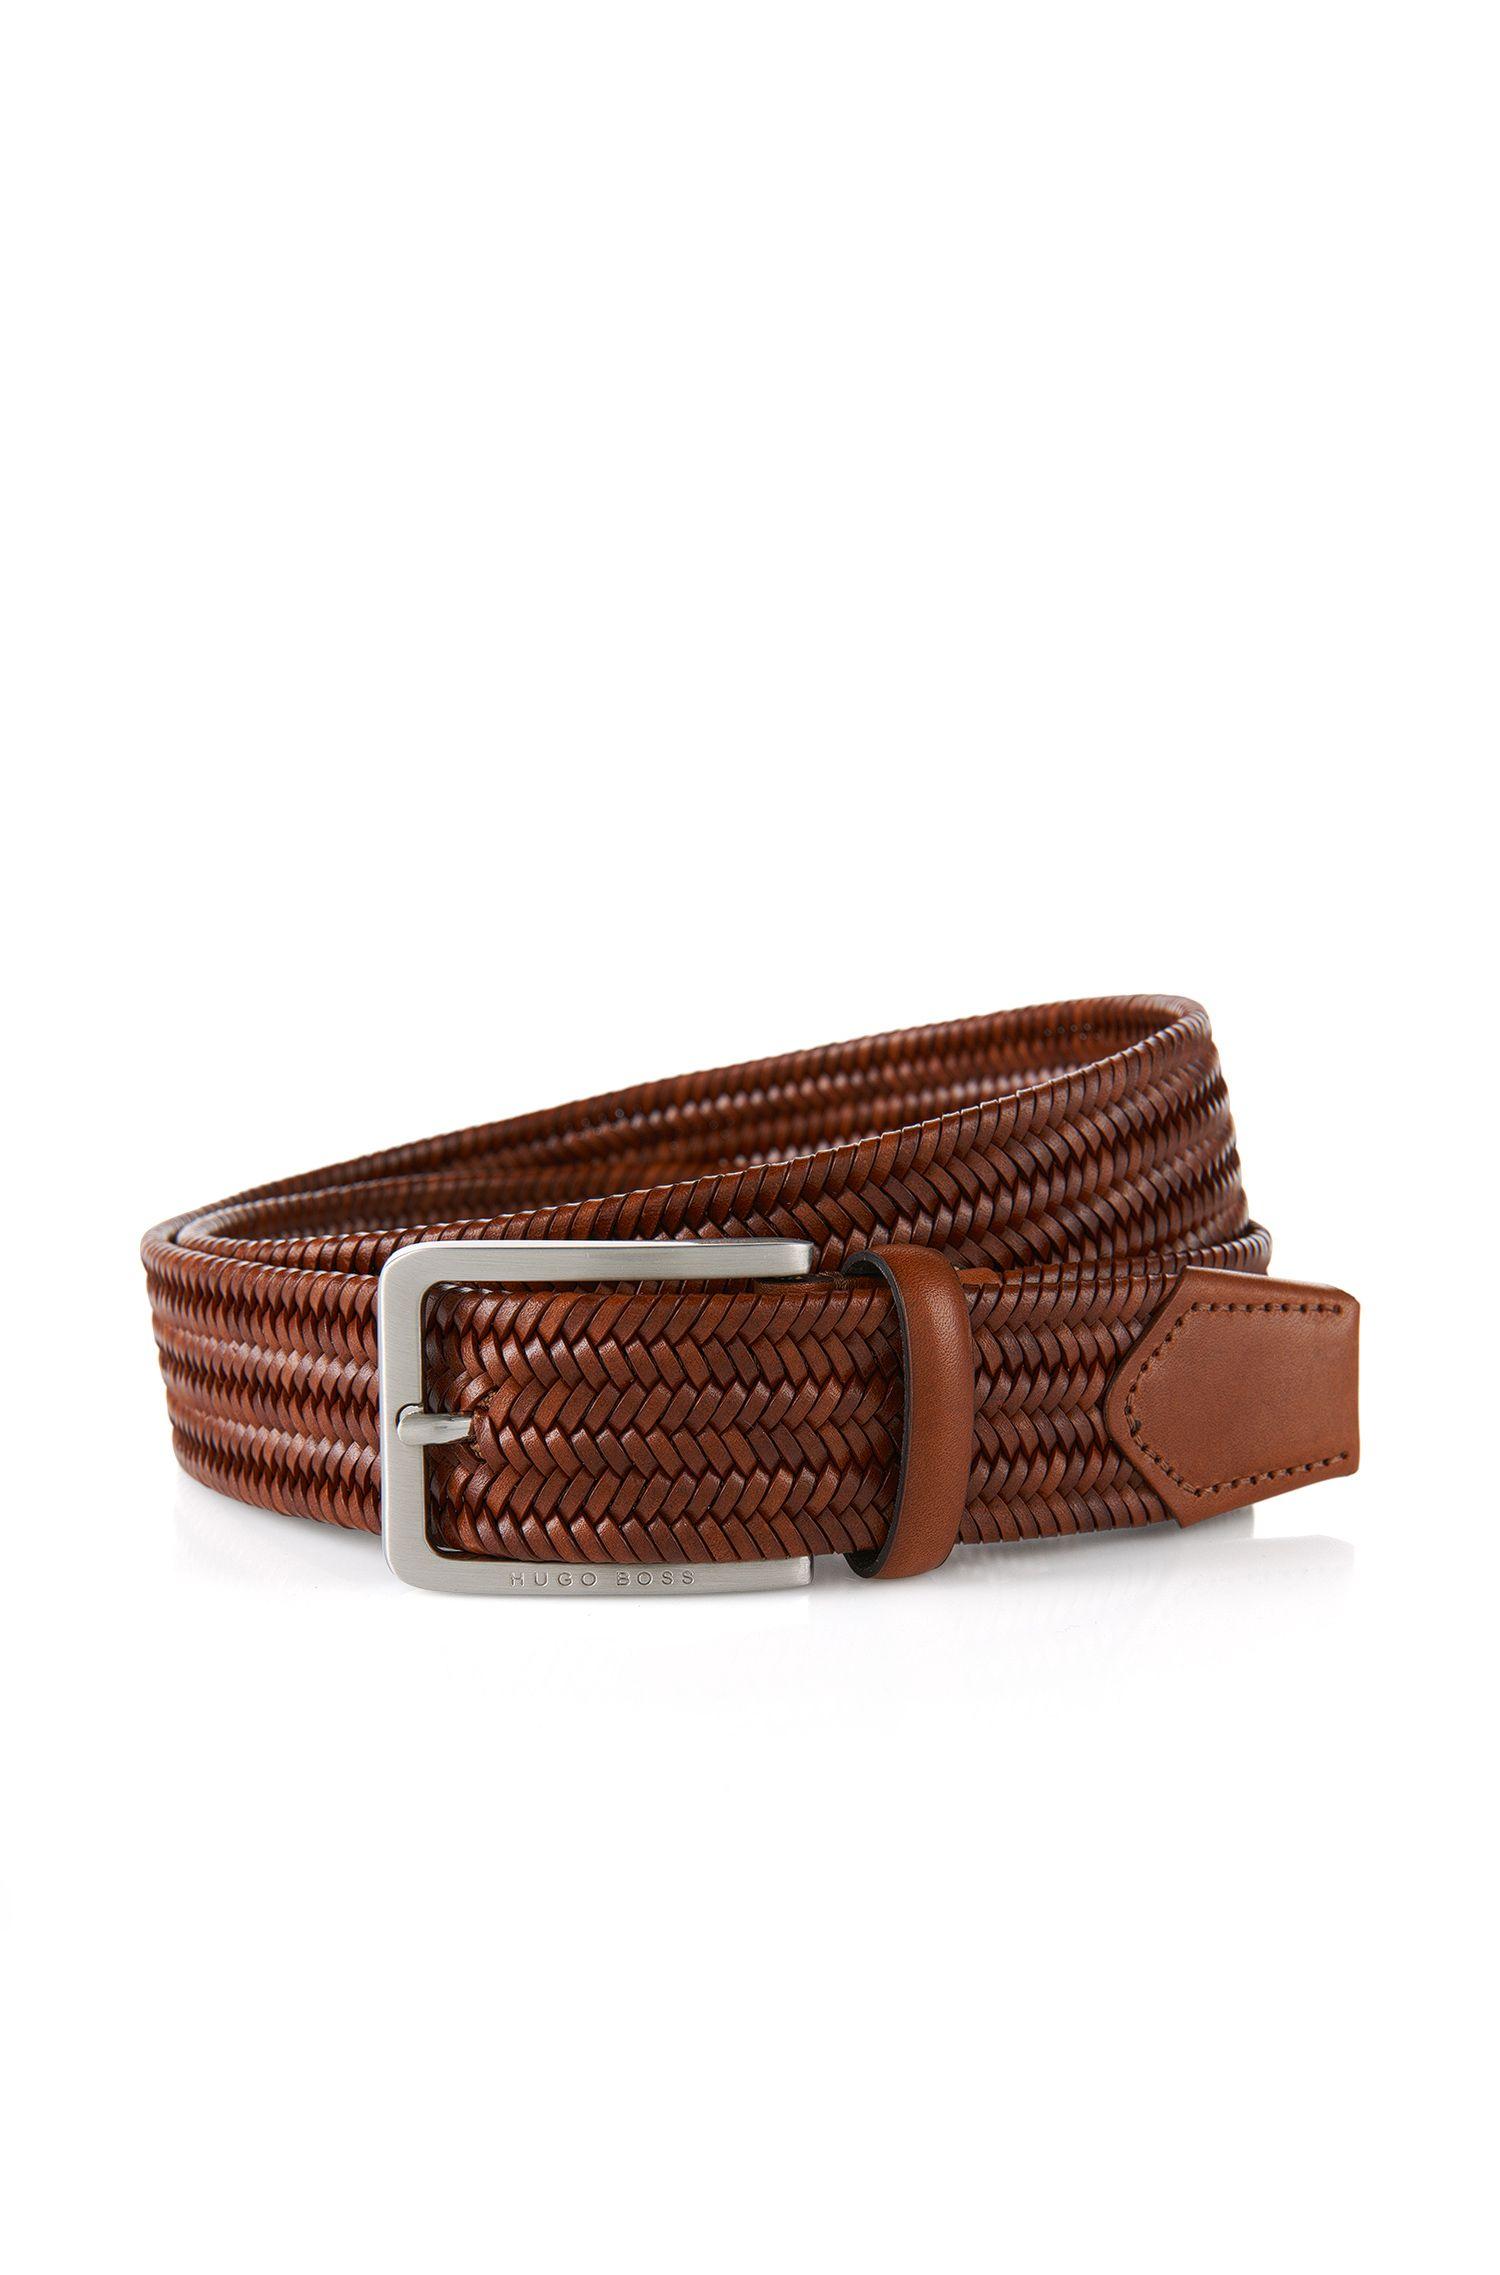 'Semy' | Italian Braided Leather Belt